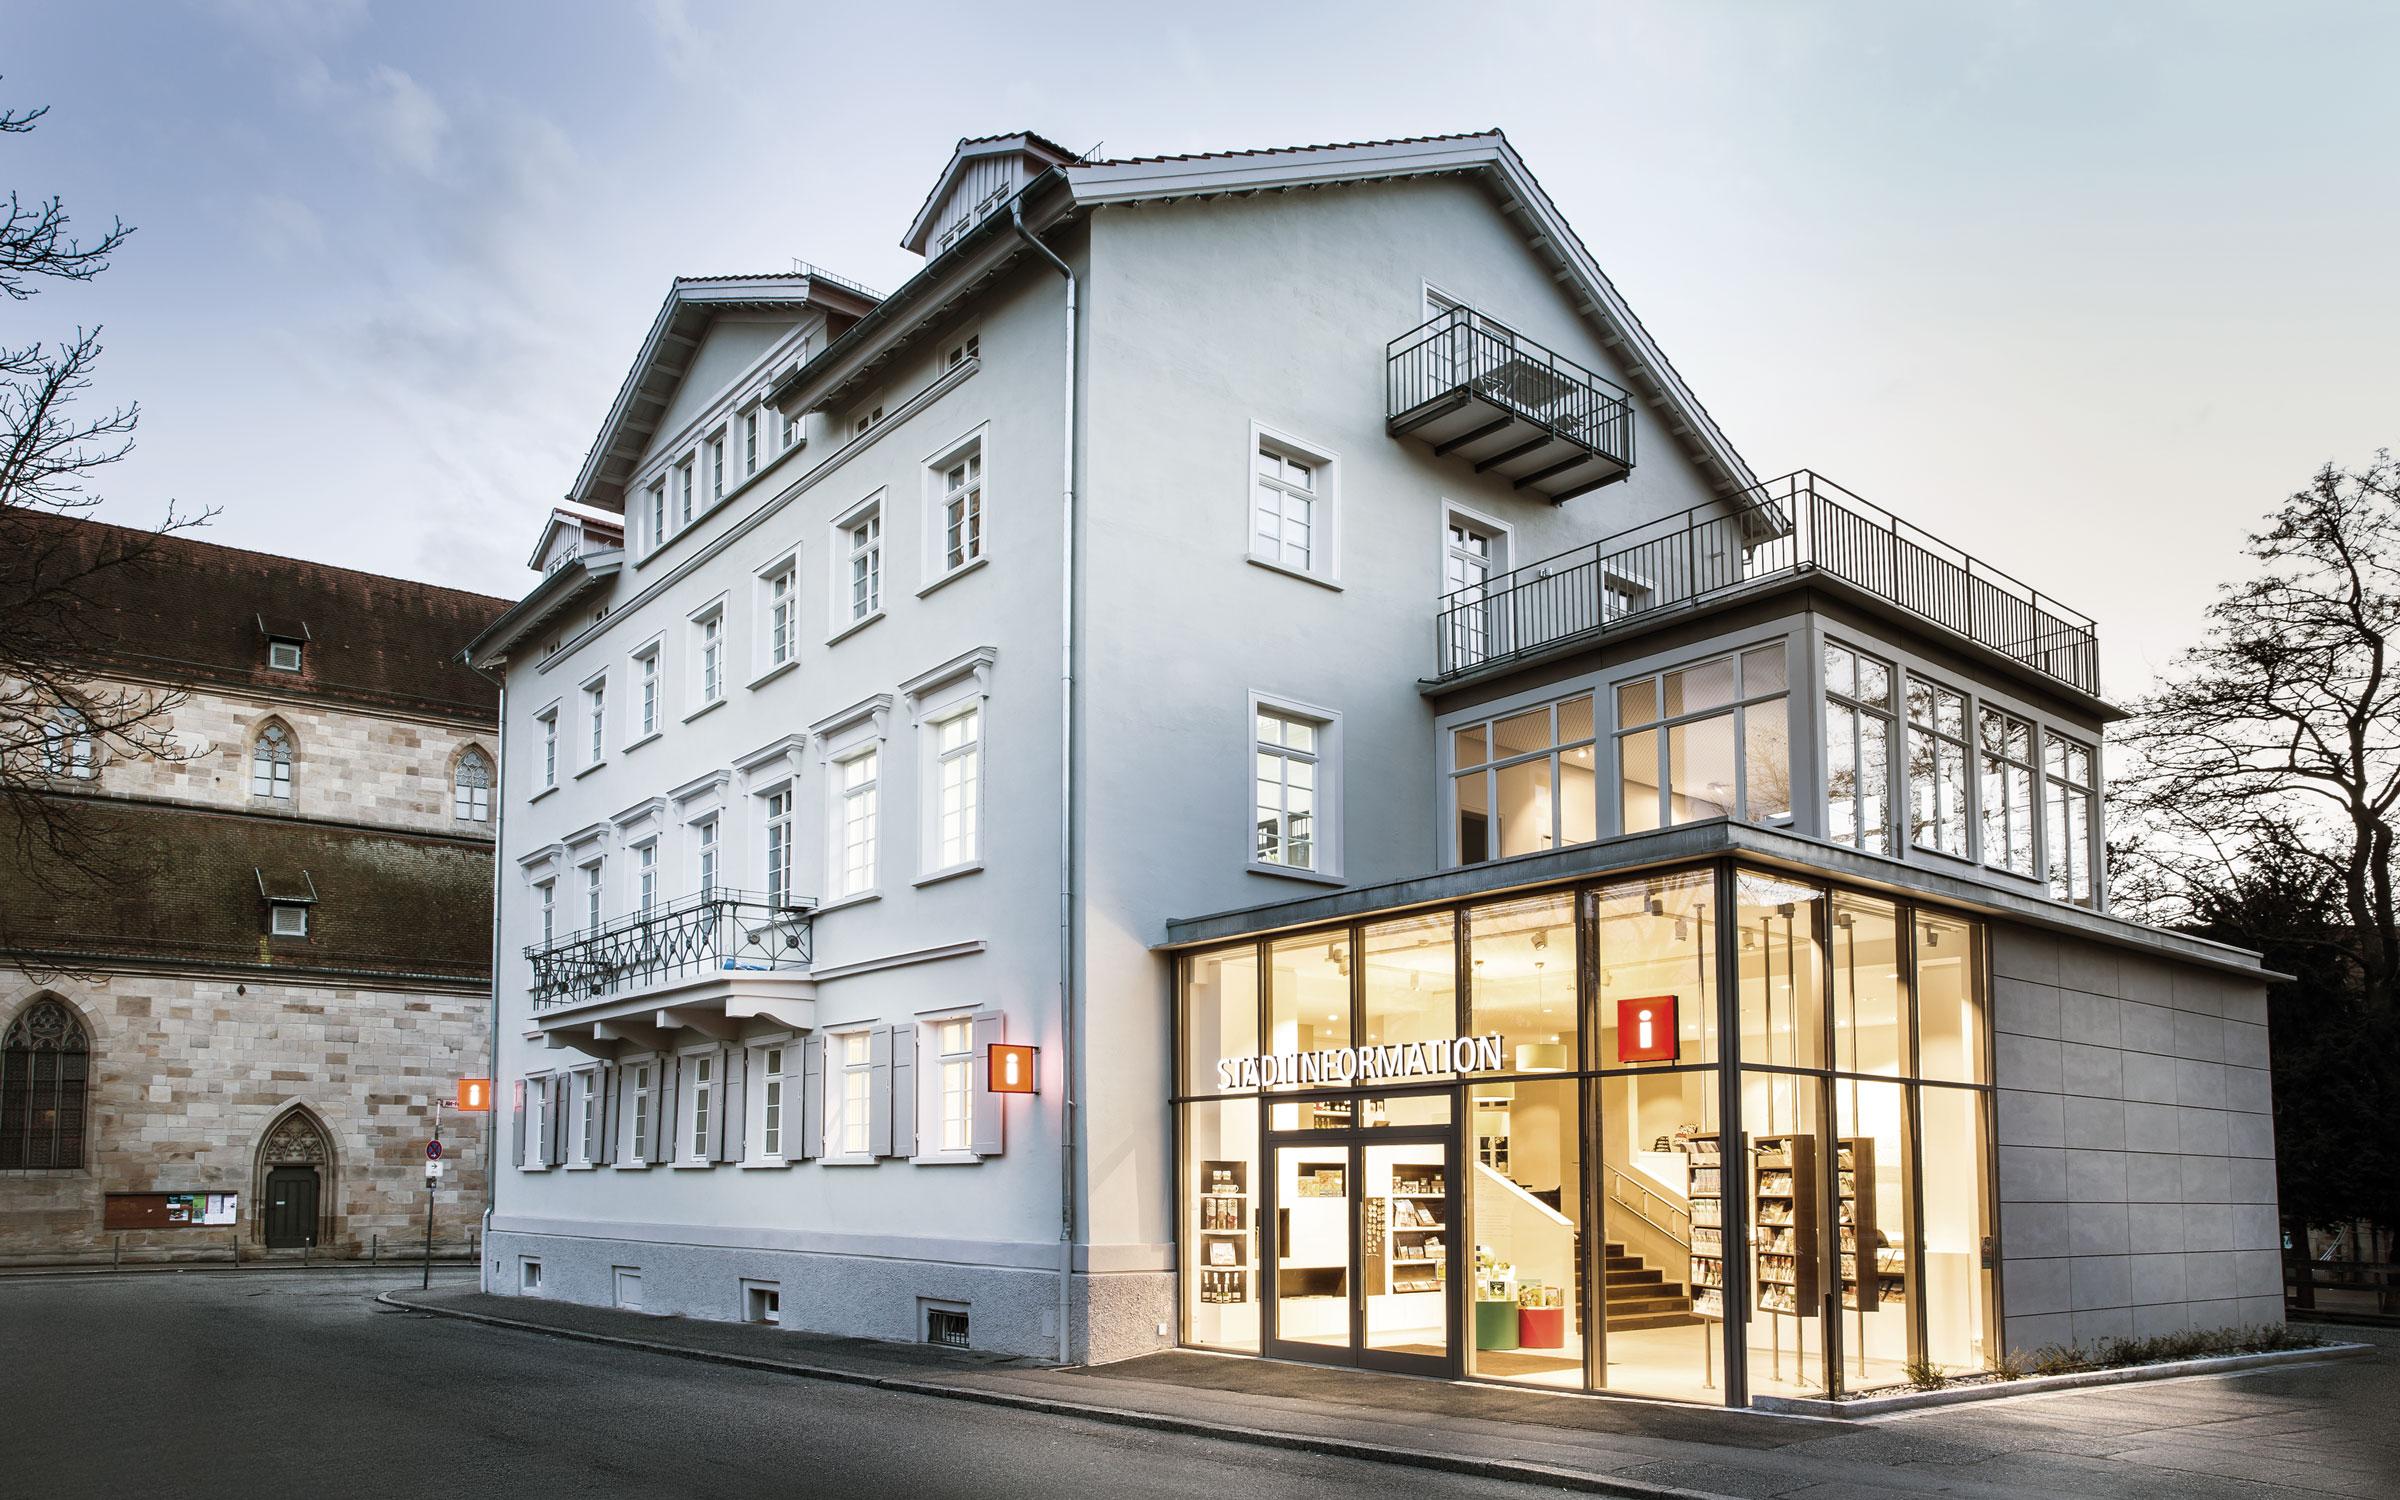 Stadtinformation Esslingen Gebäude